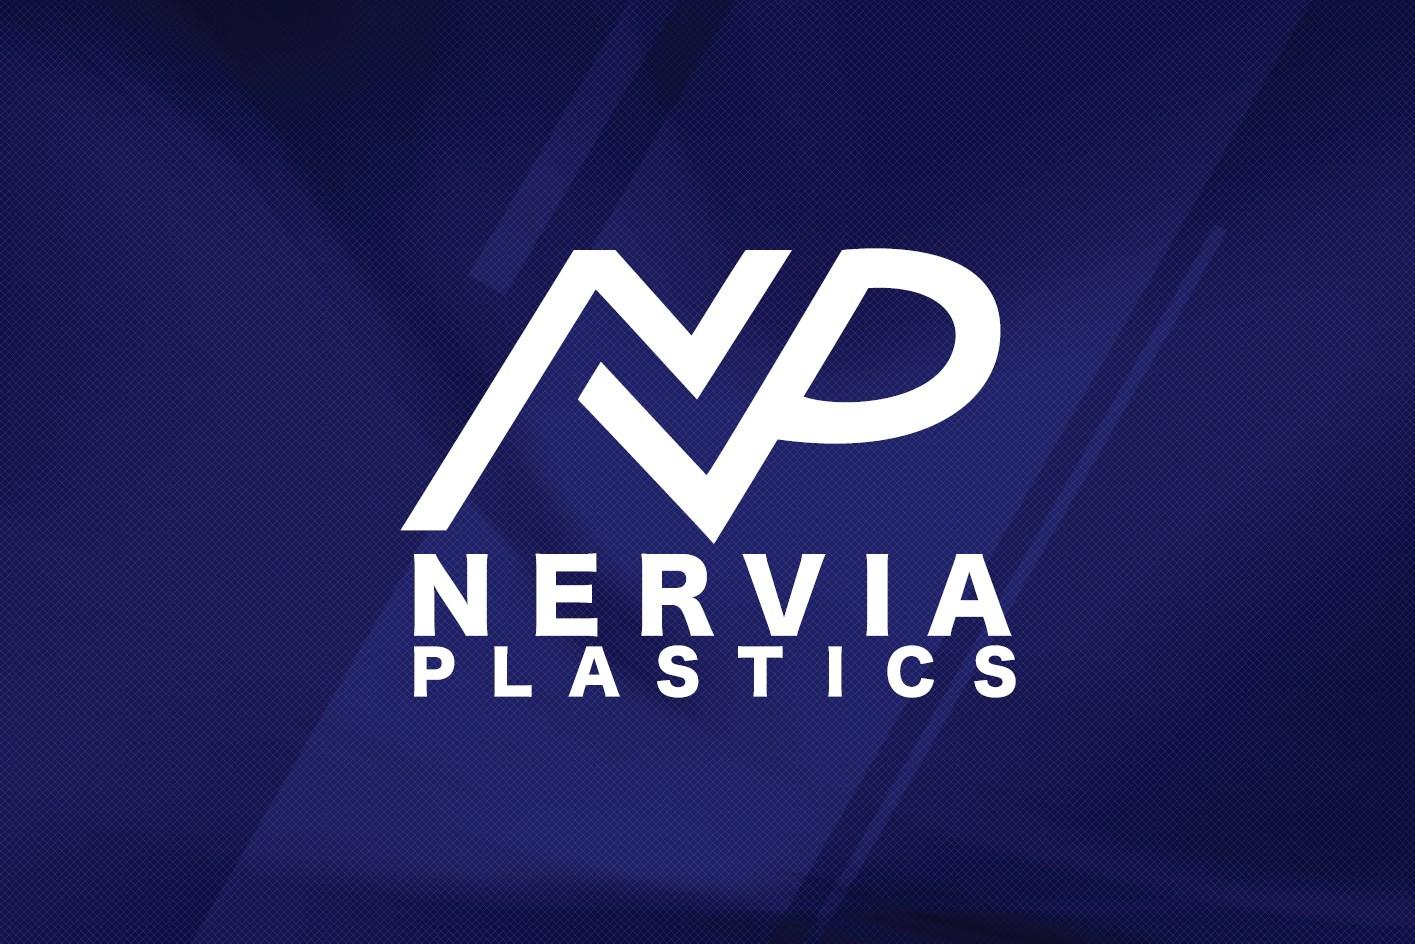 Nervia Plastics